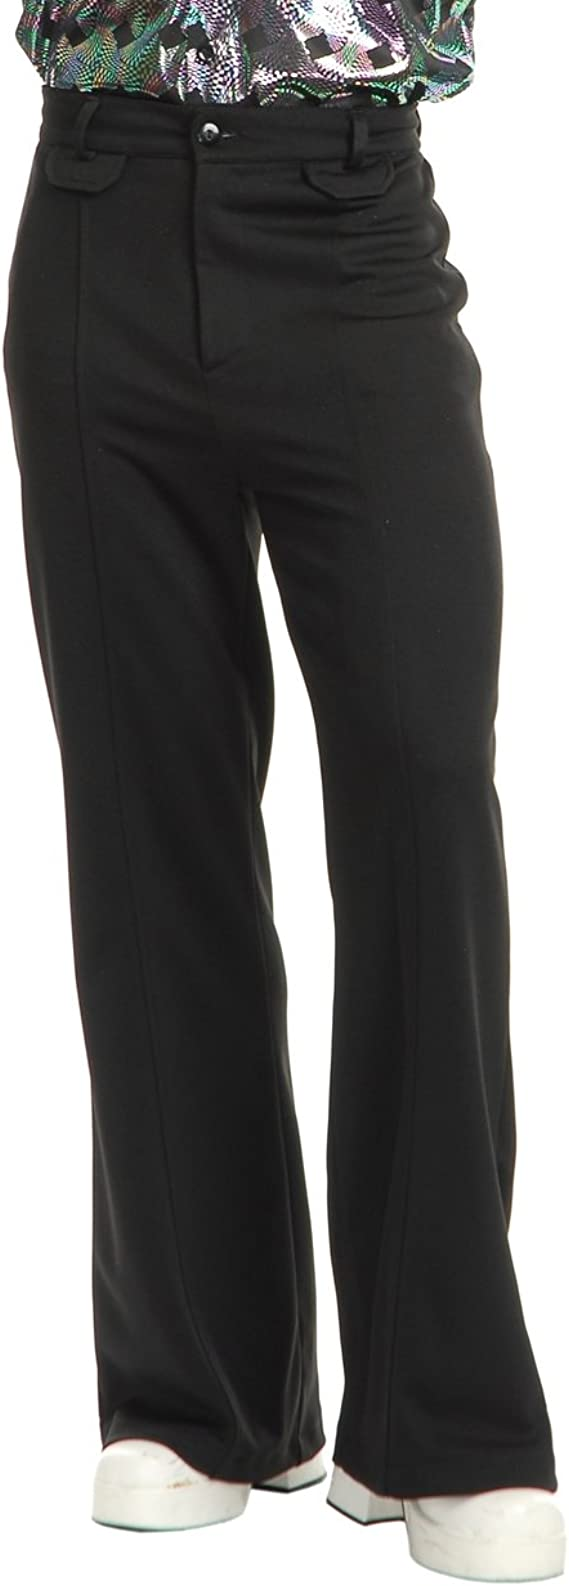 Pantalones disco para hombre de Charades, color negro